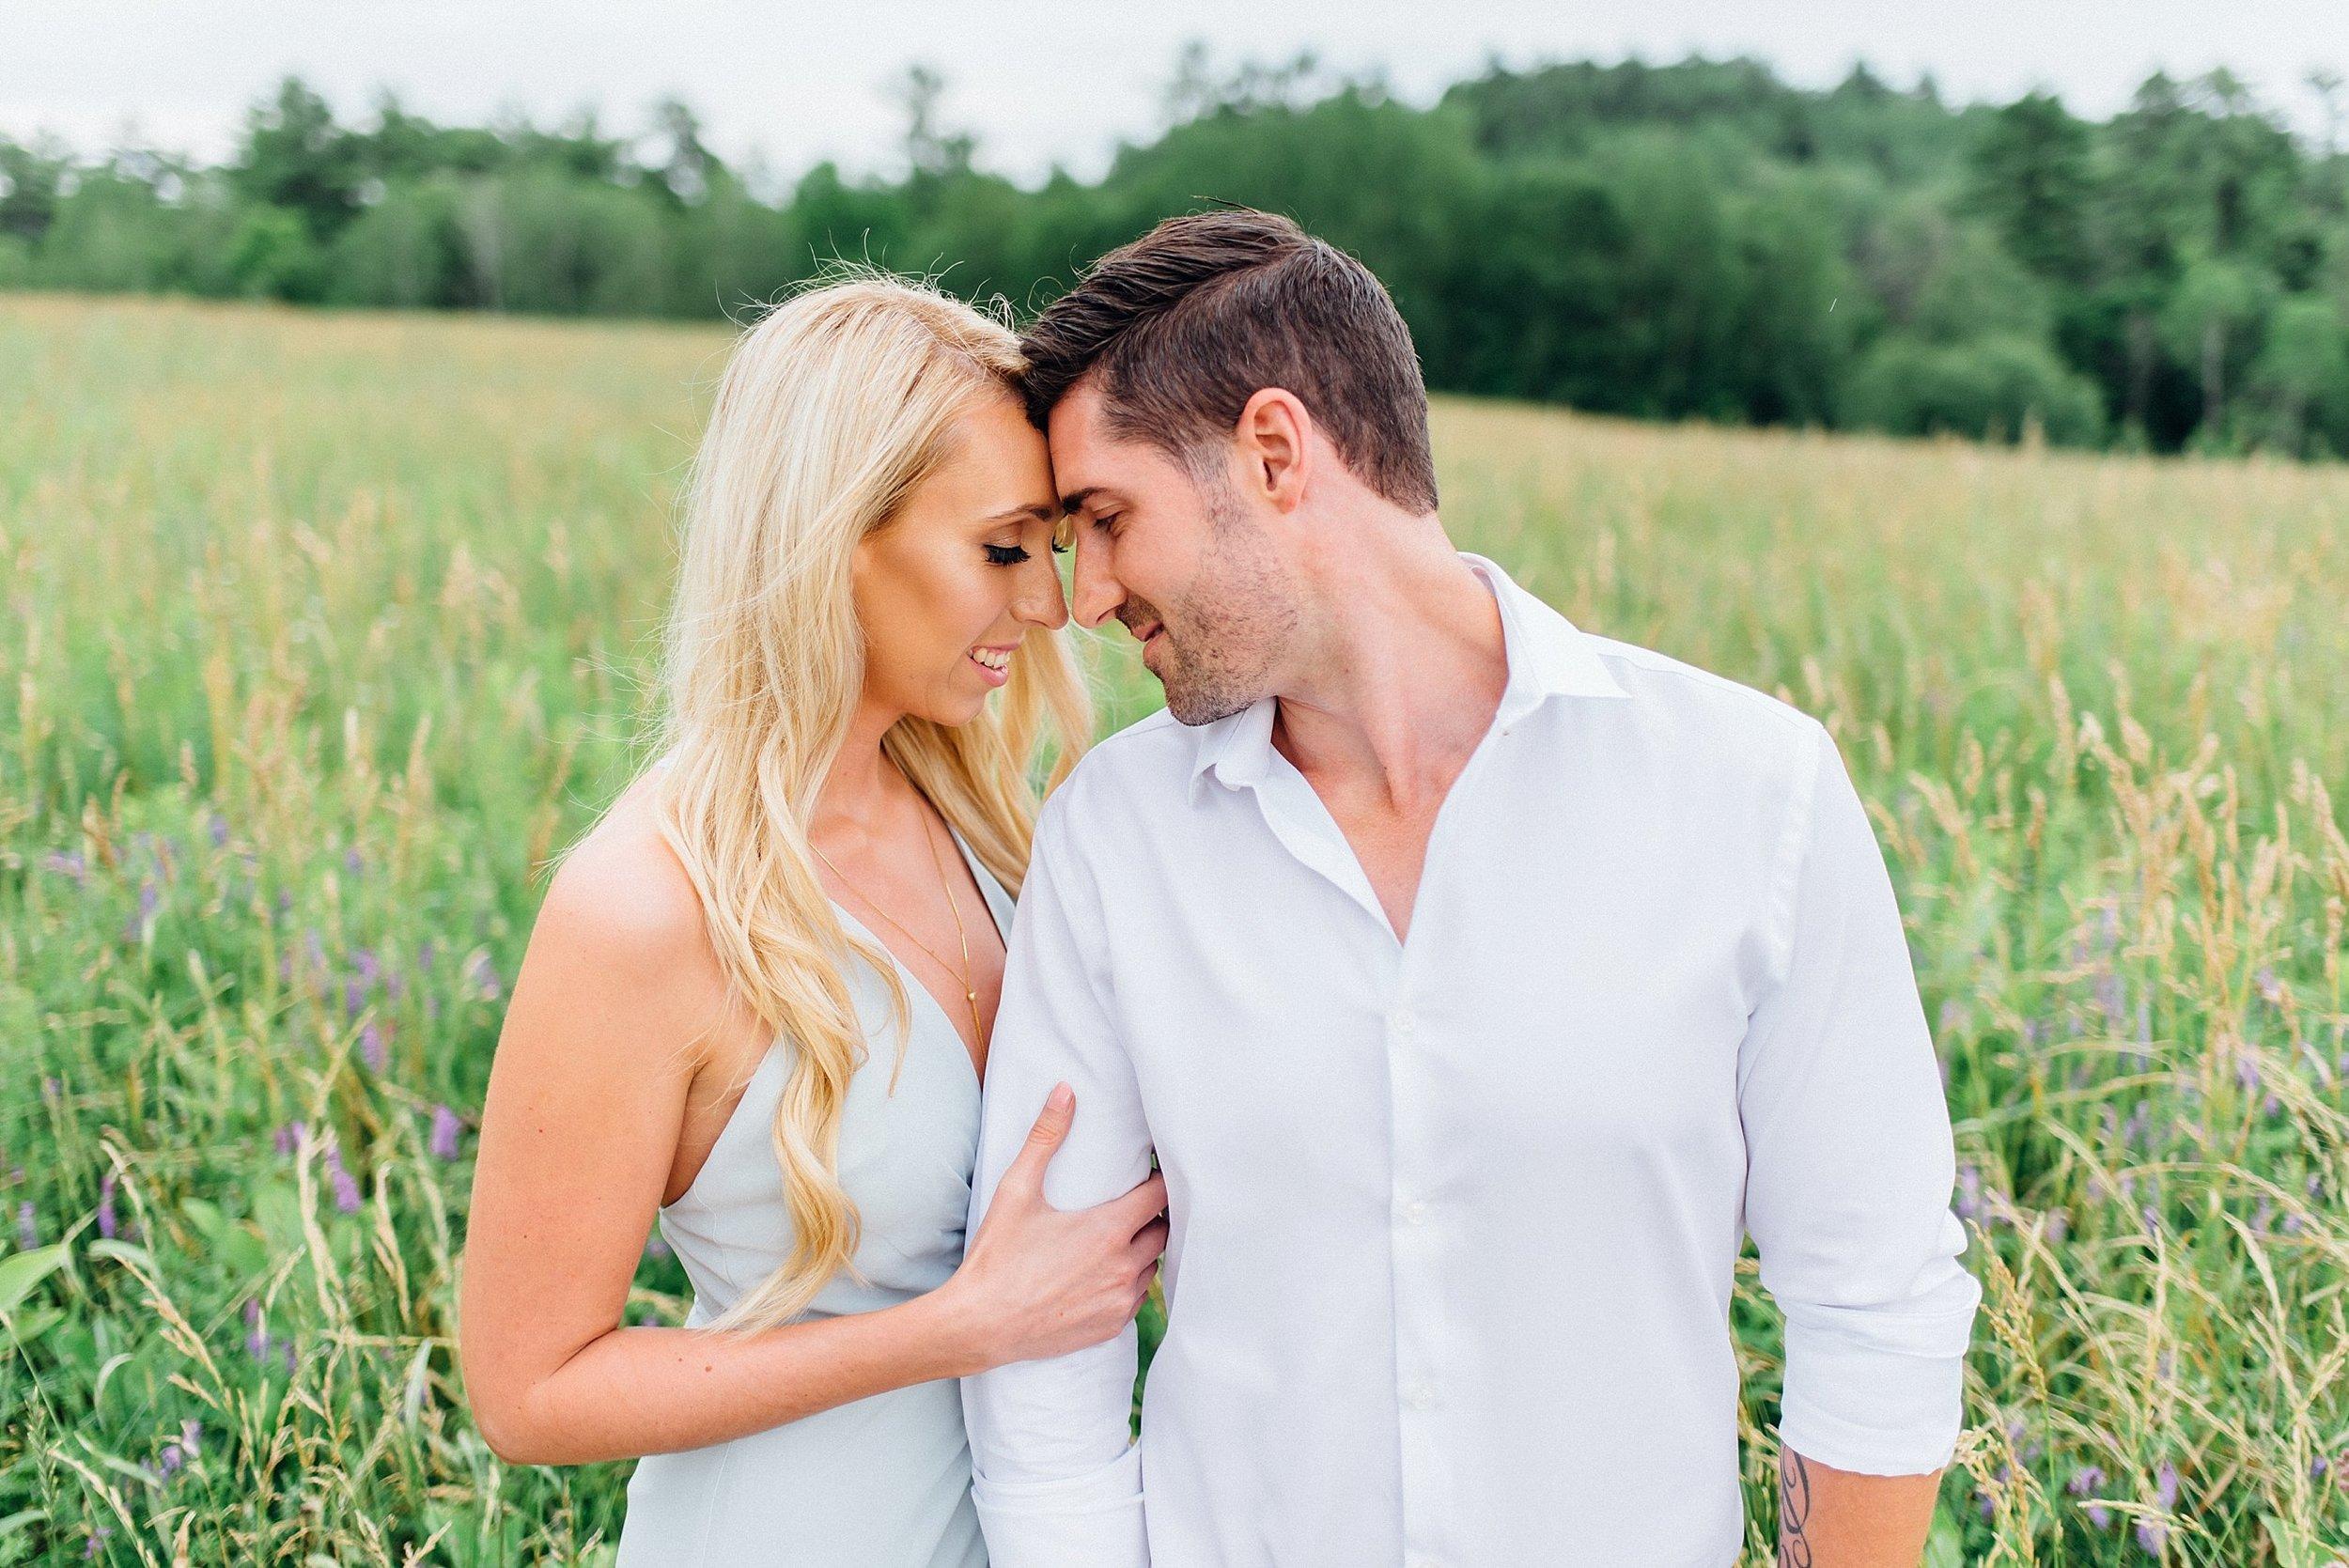 light, airy, fine art, documentary ottawa wedding photographer - best engagement photos 2017_0021.jpg